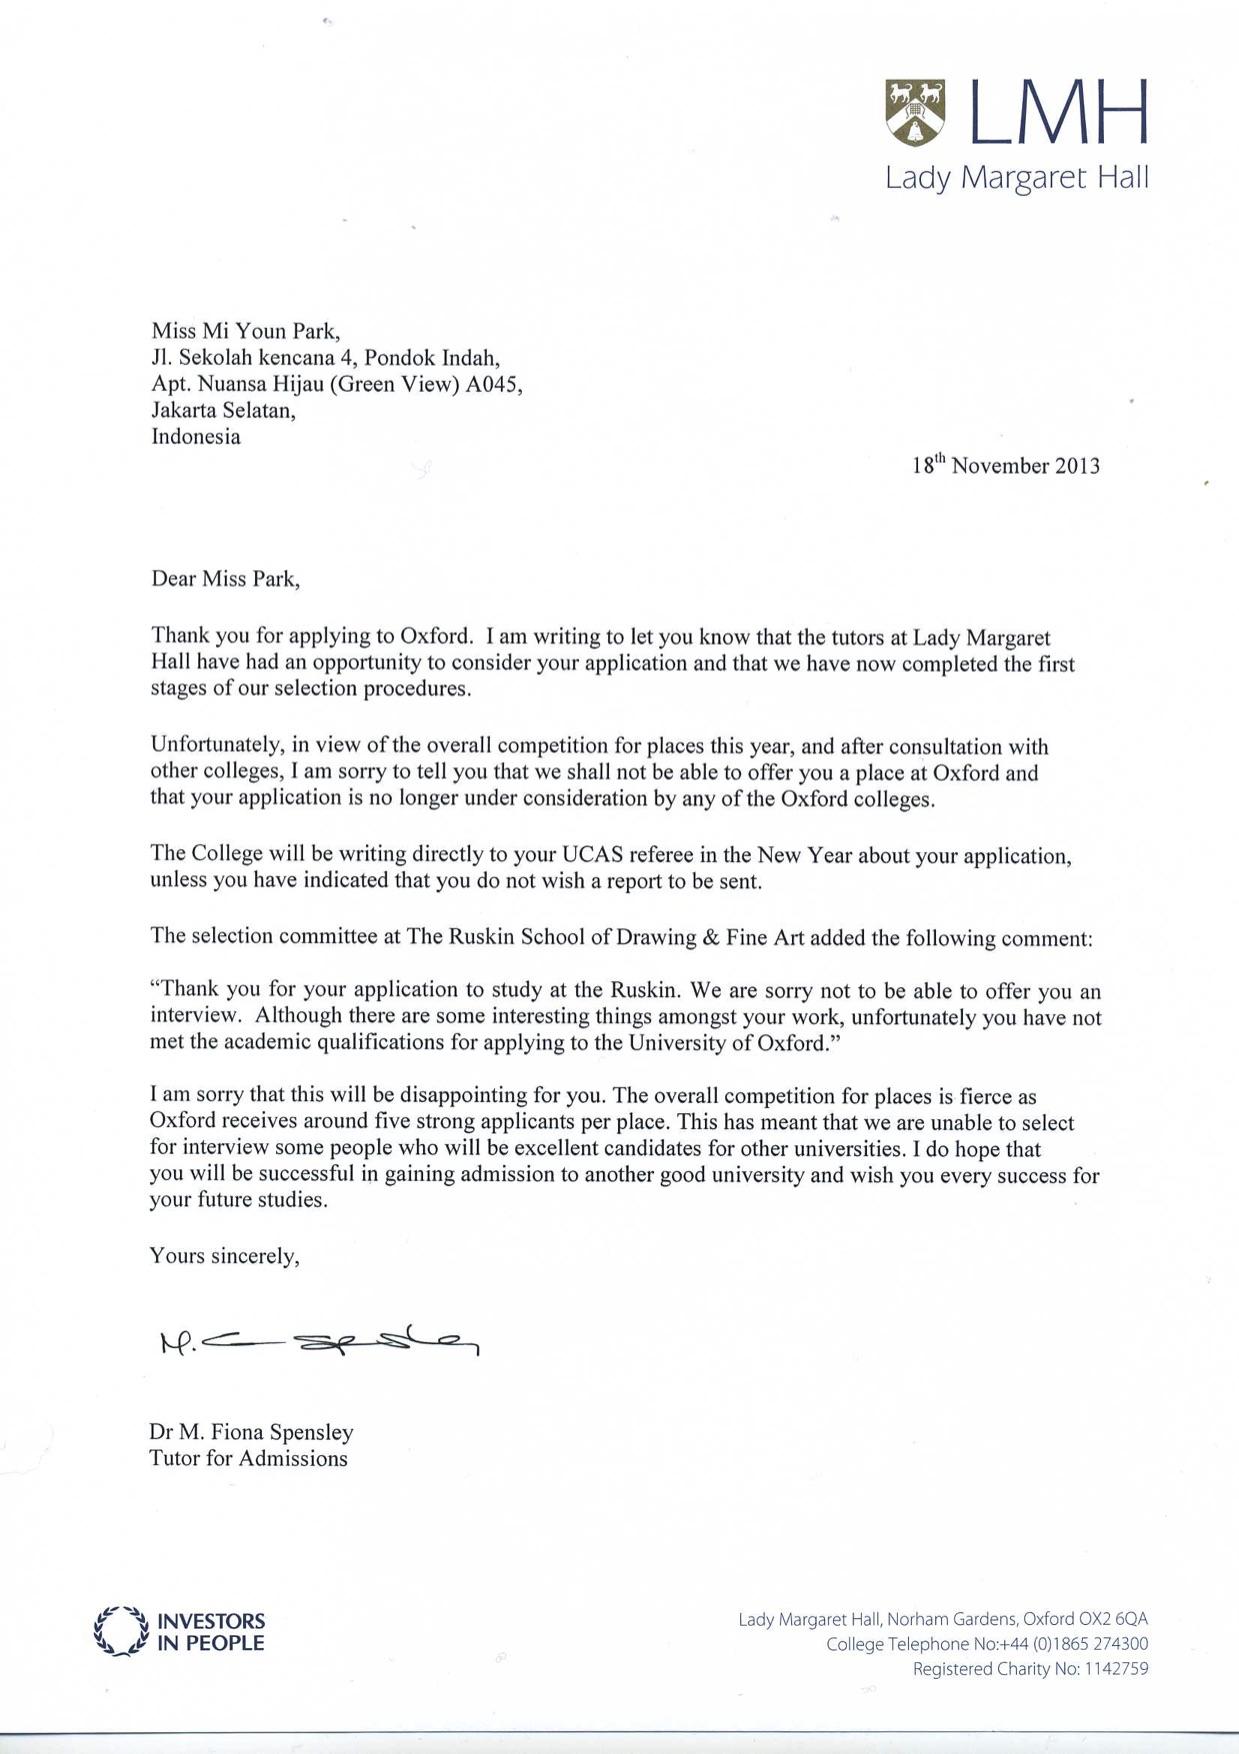 oxford rejection letter 2014